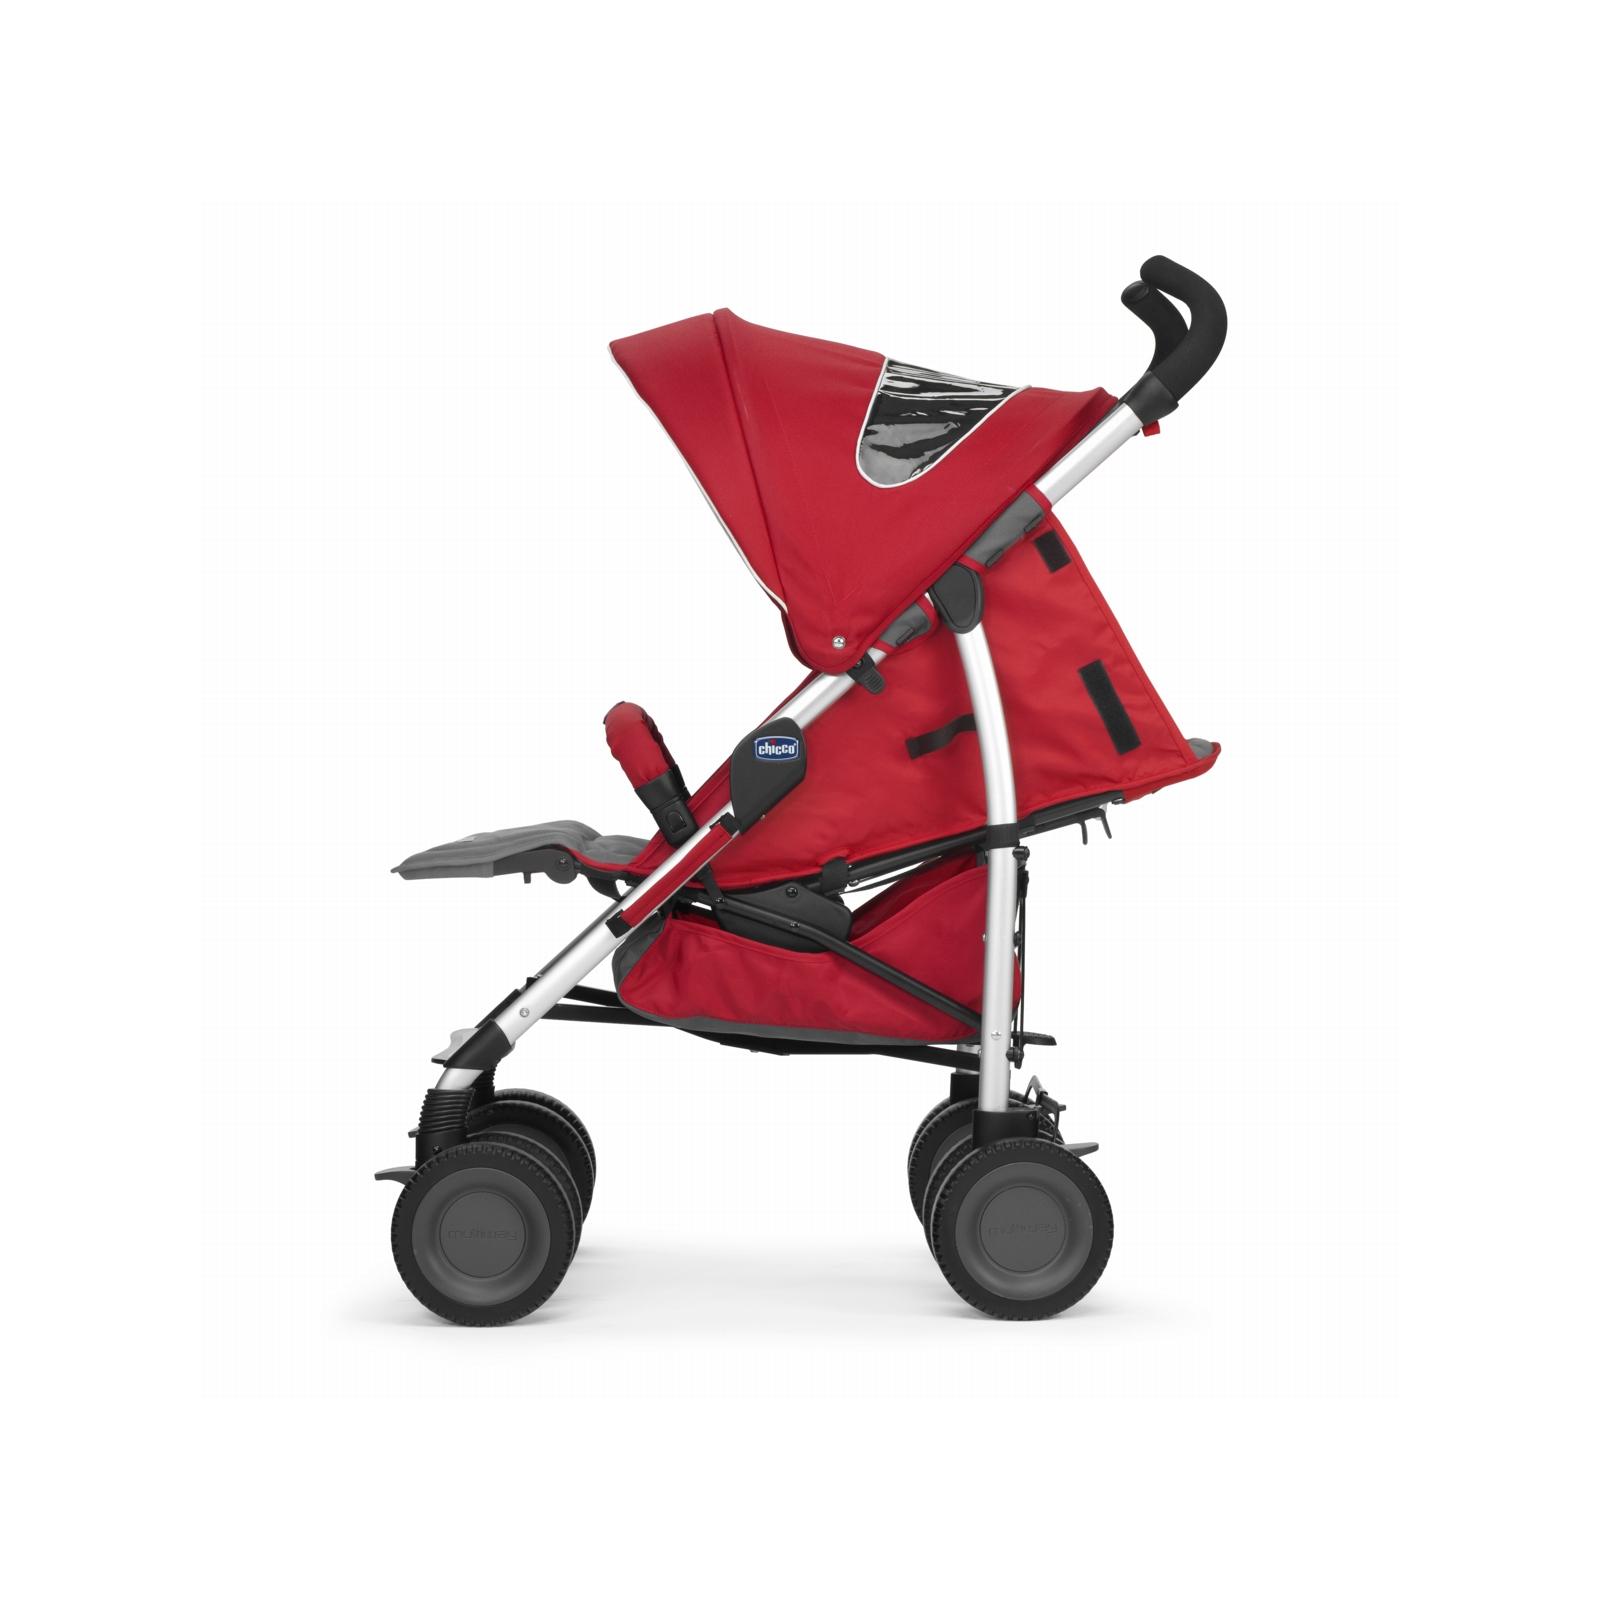 Коляска Chicco Multiway Evo Stroller Red (79315.70) изображение 4